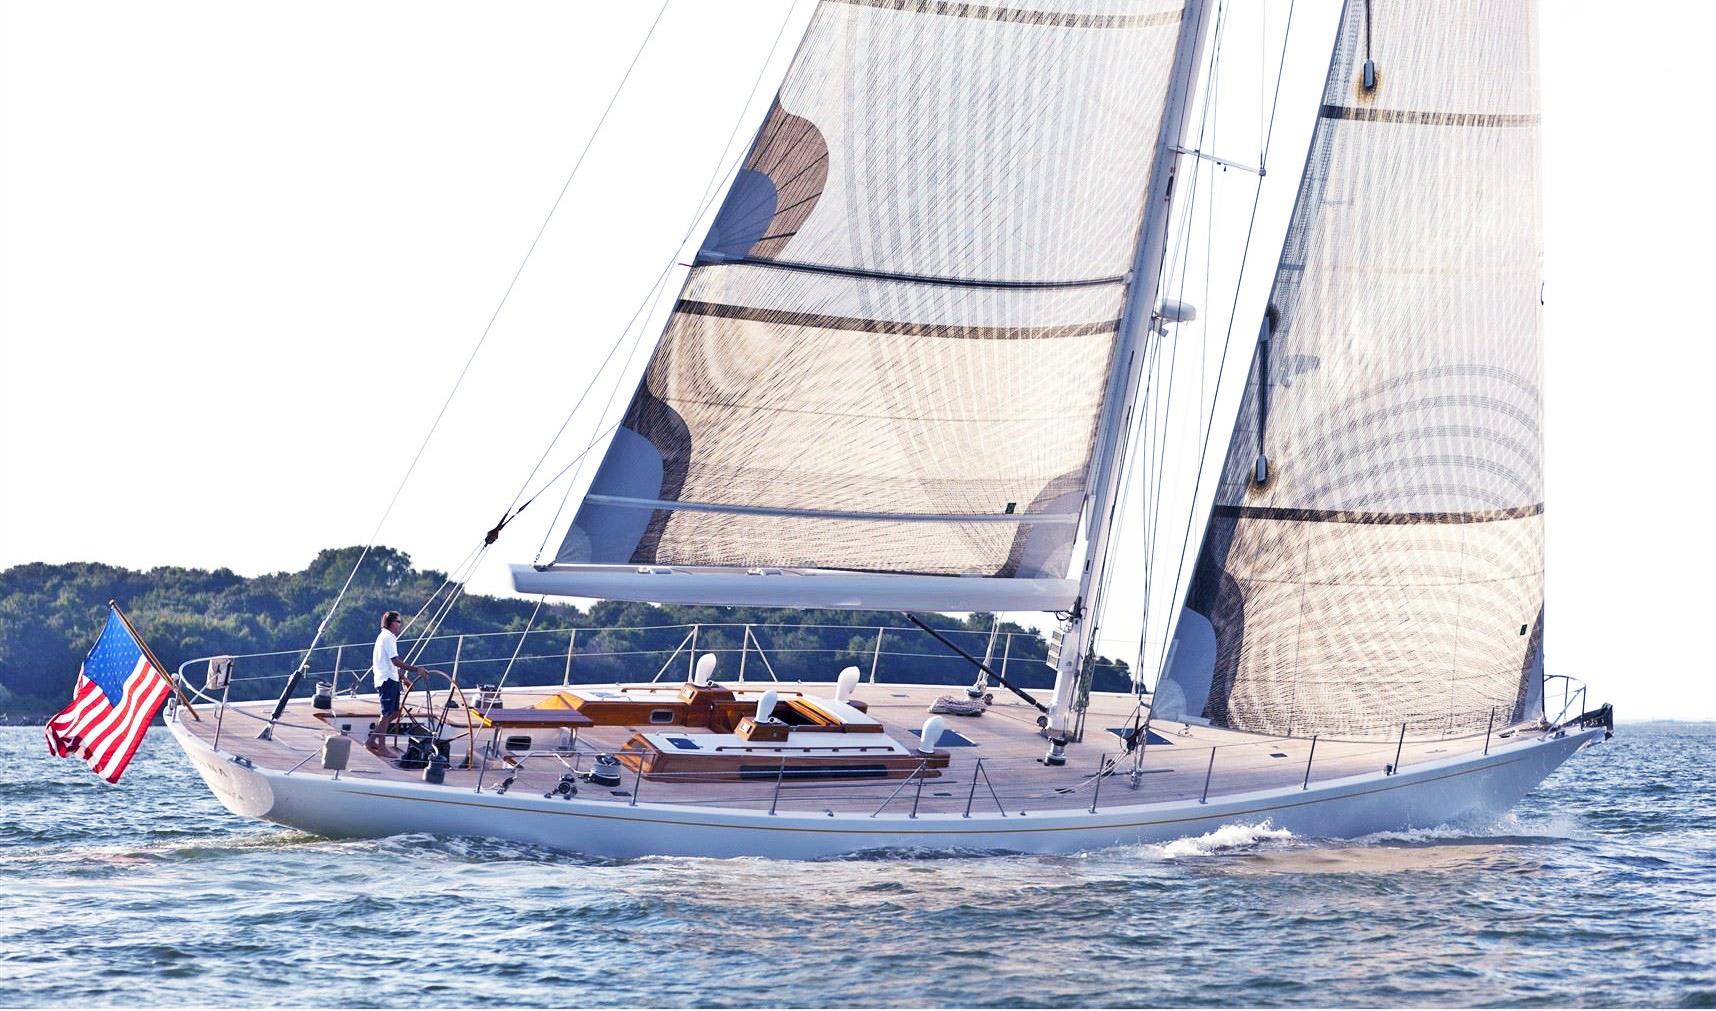 HEROINA-yacht-vbs-01.jpg